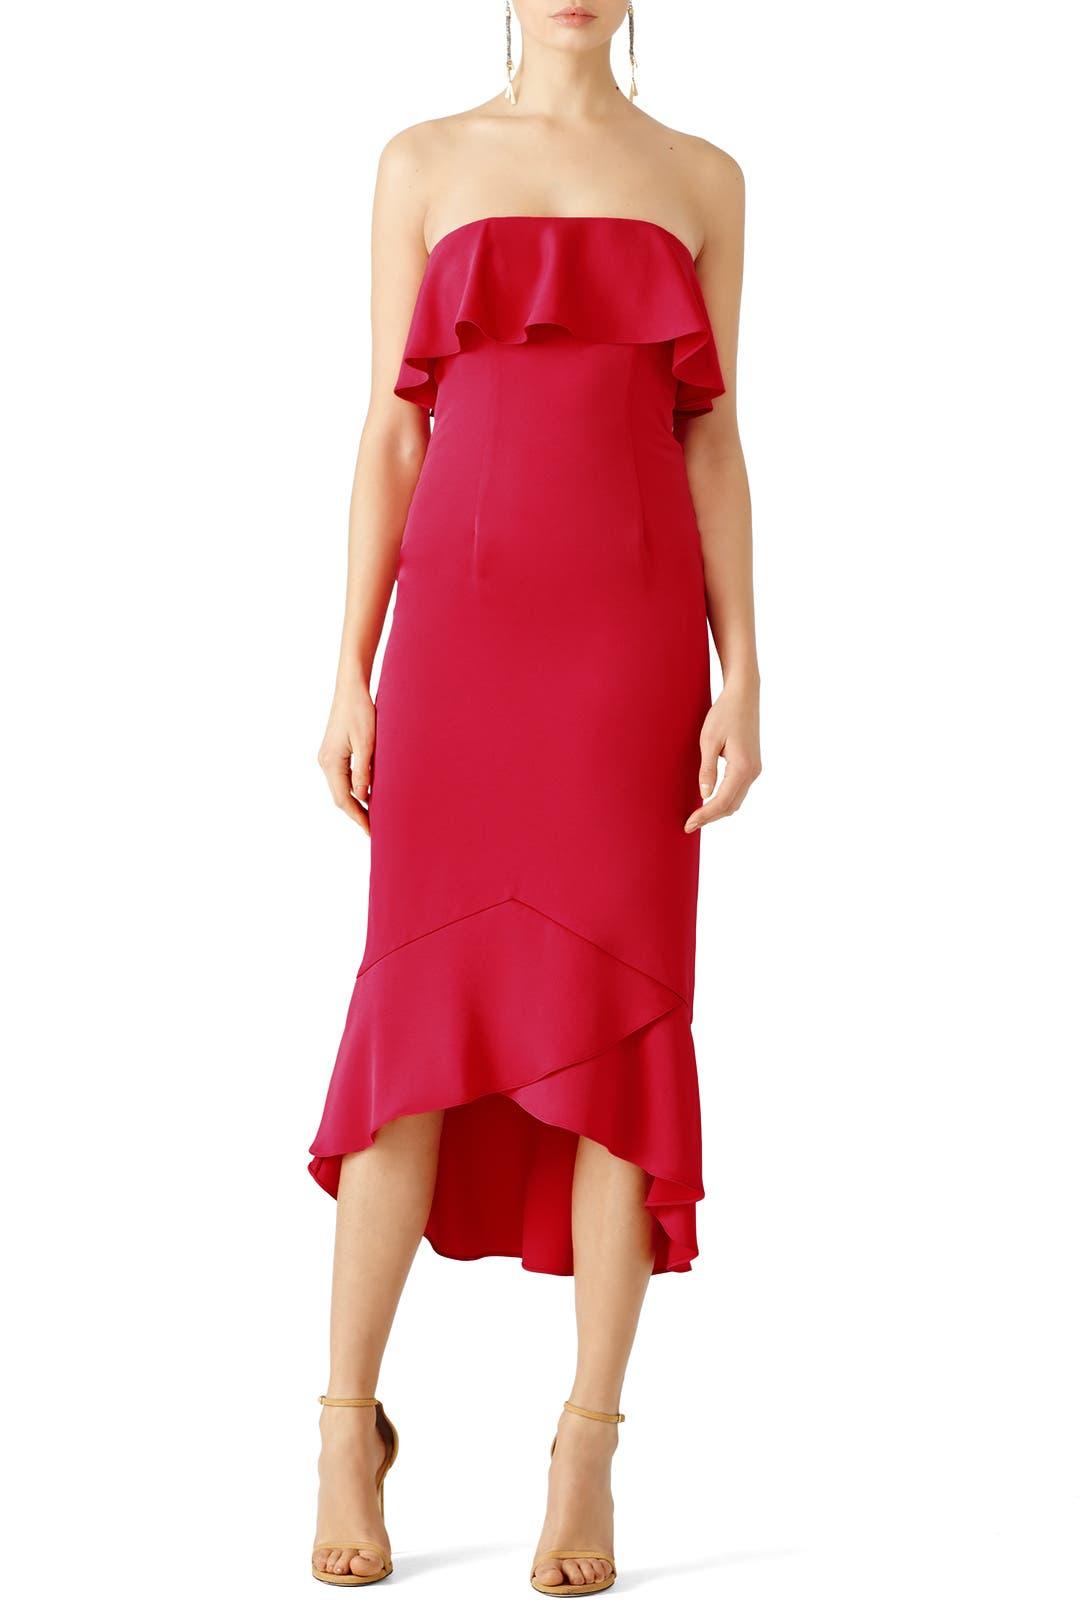 Shoshanna Pink Essie Midi Dress